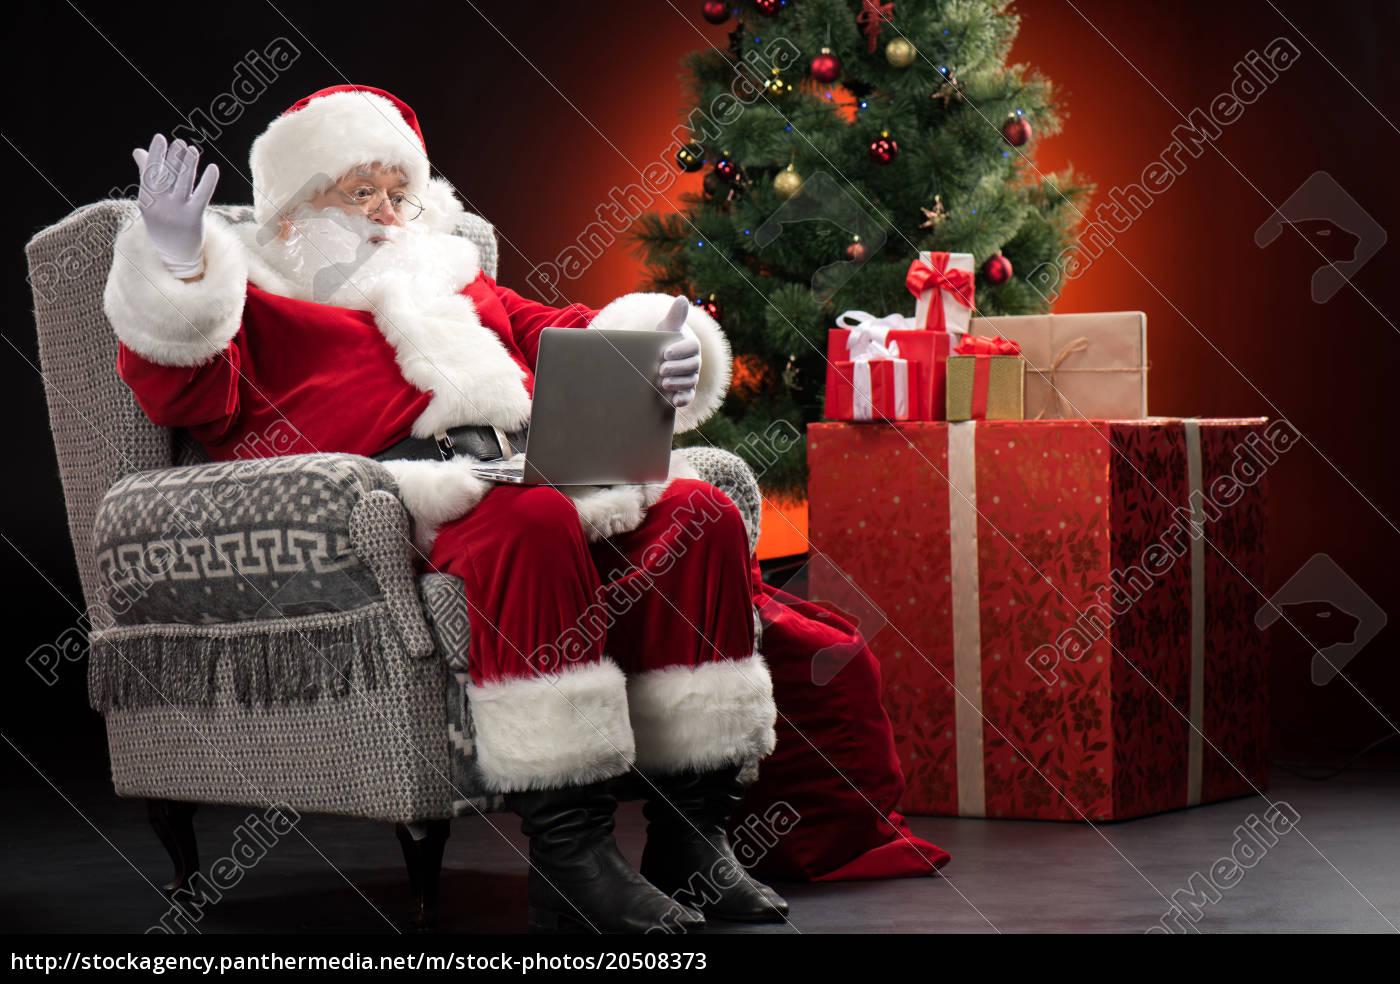 santa, claus, using, laptop, and, gesturing - 20508373